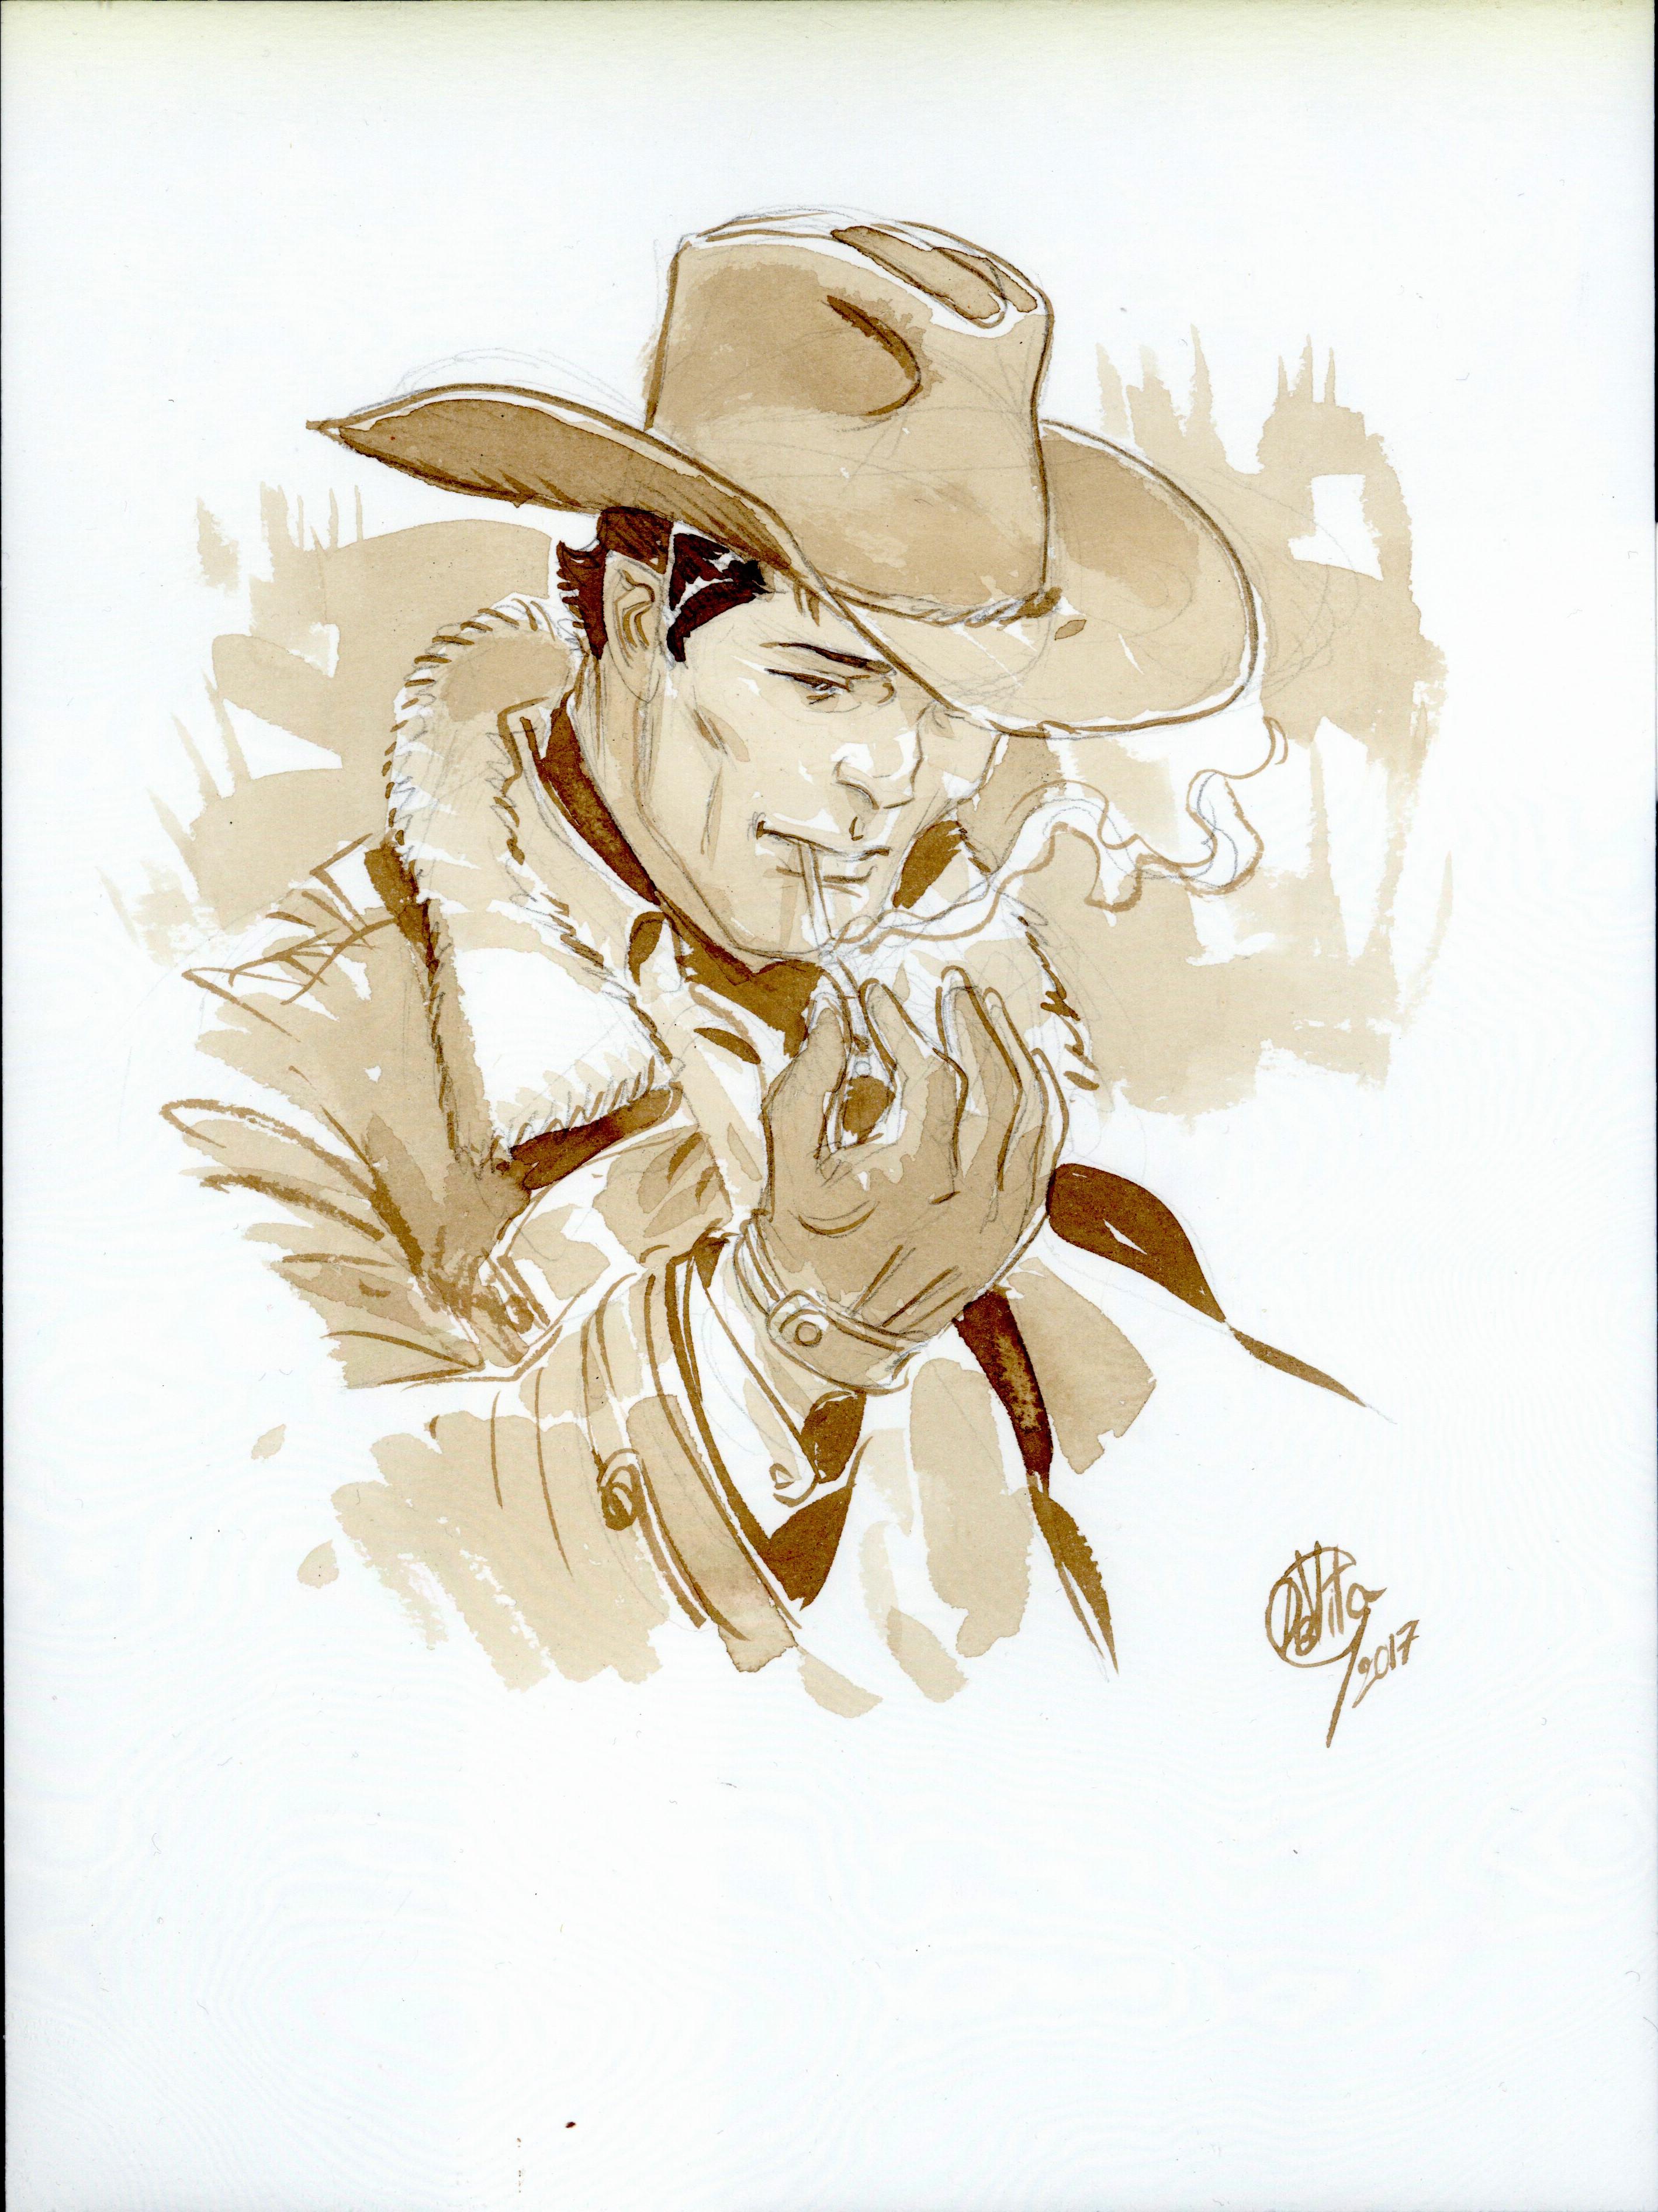 de-vita-cowboy-avec-cigarette-37sx.jpg